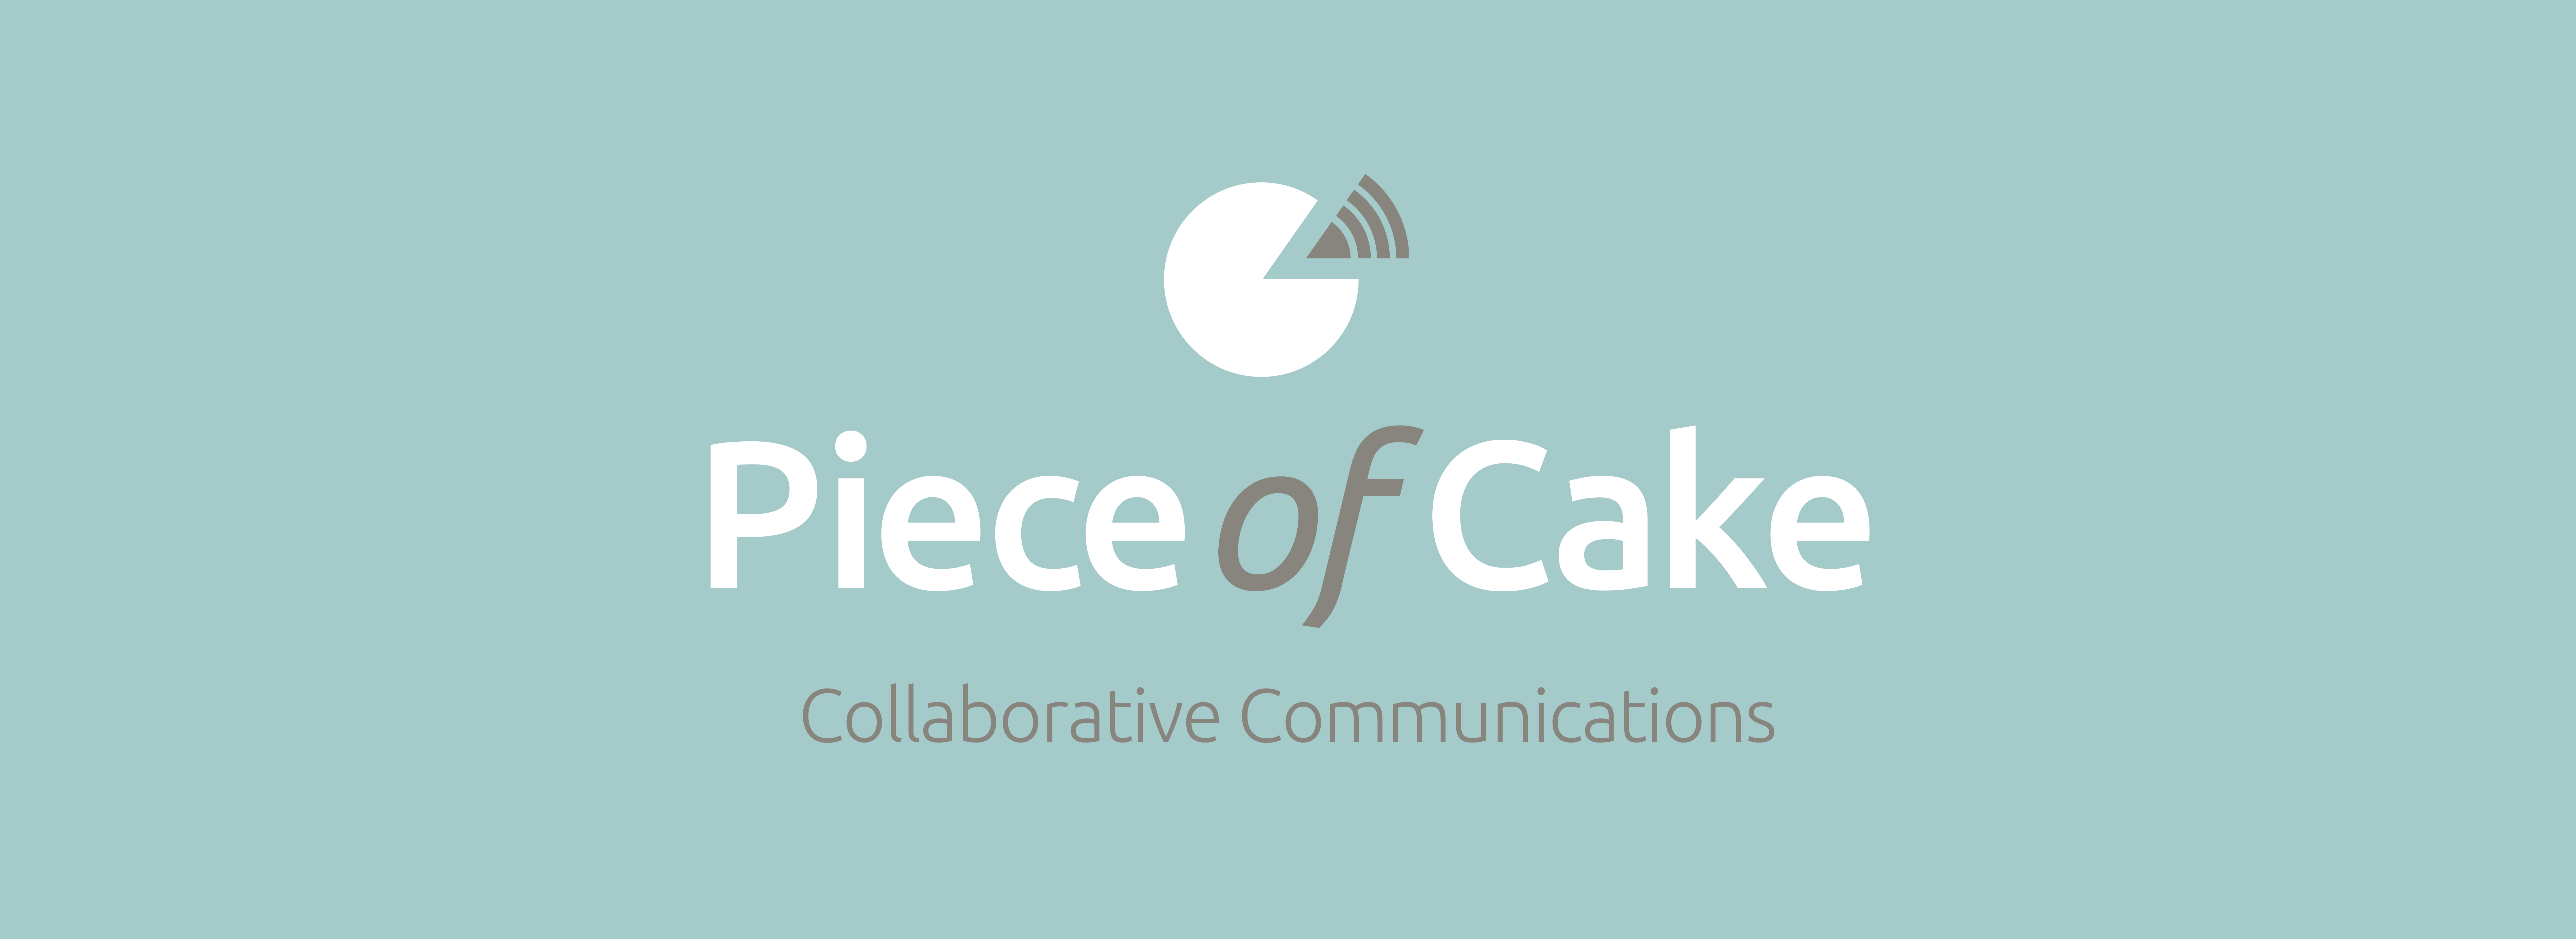 Piece of Cake Communications